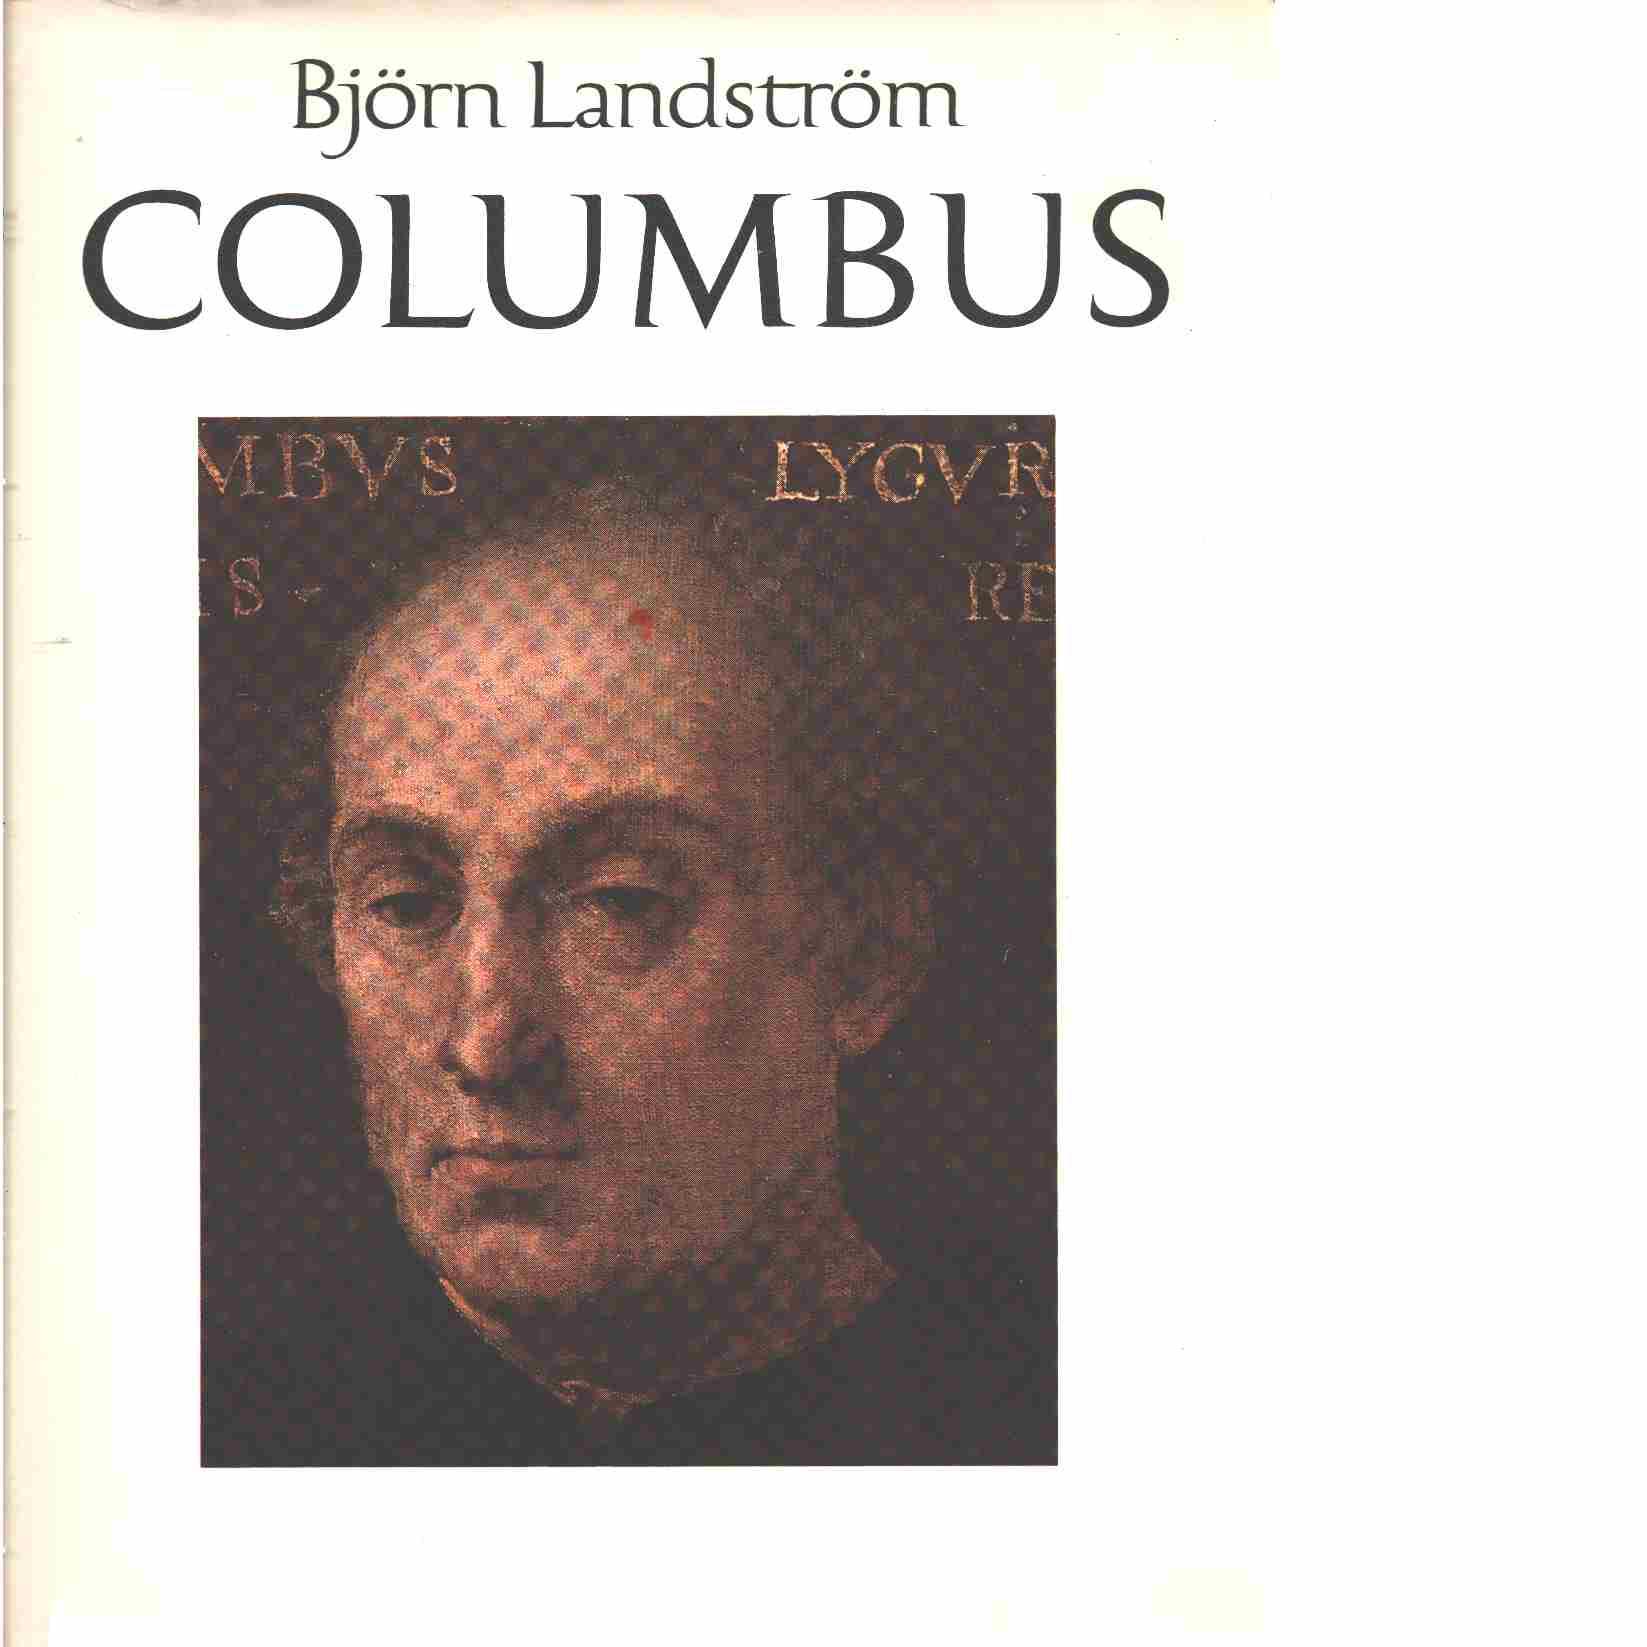 Columbus - Landström, Björn